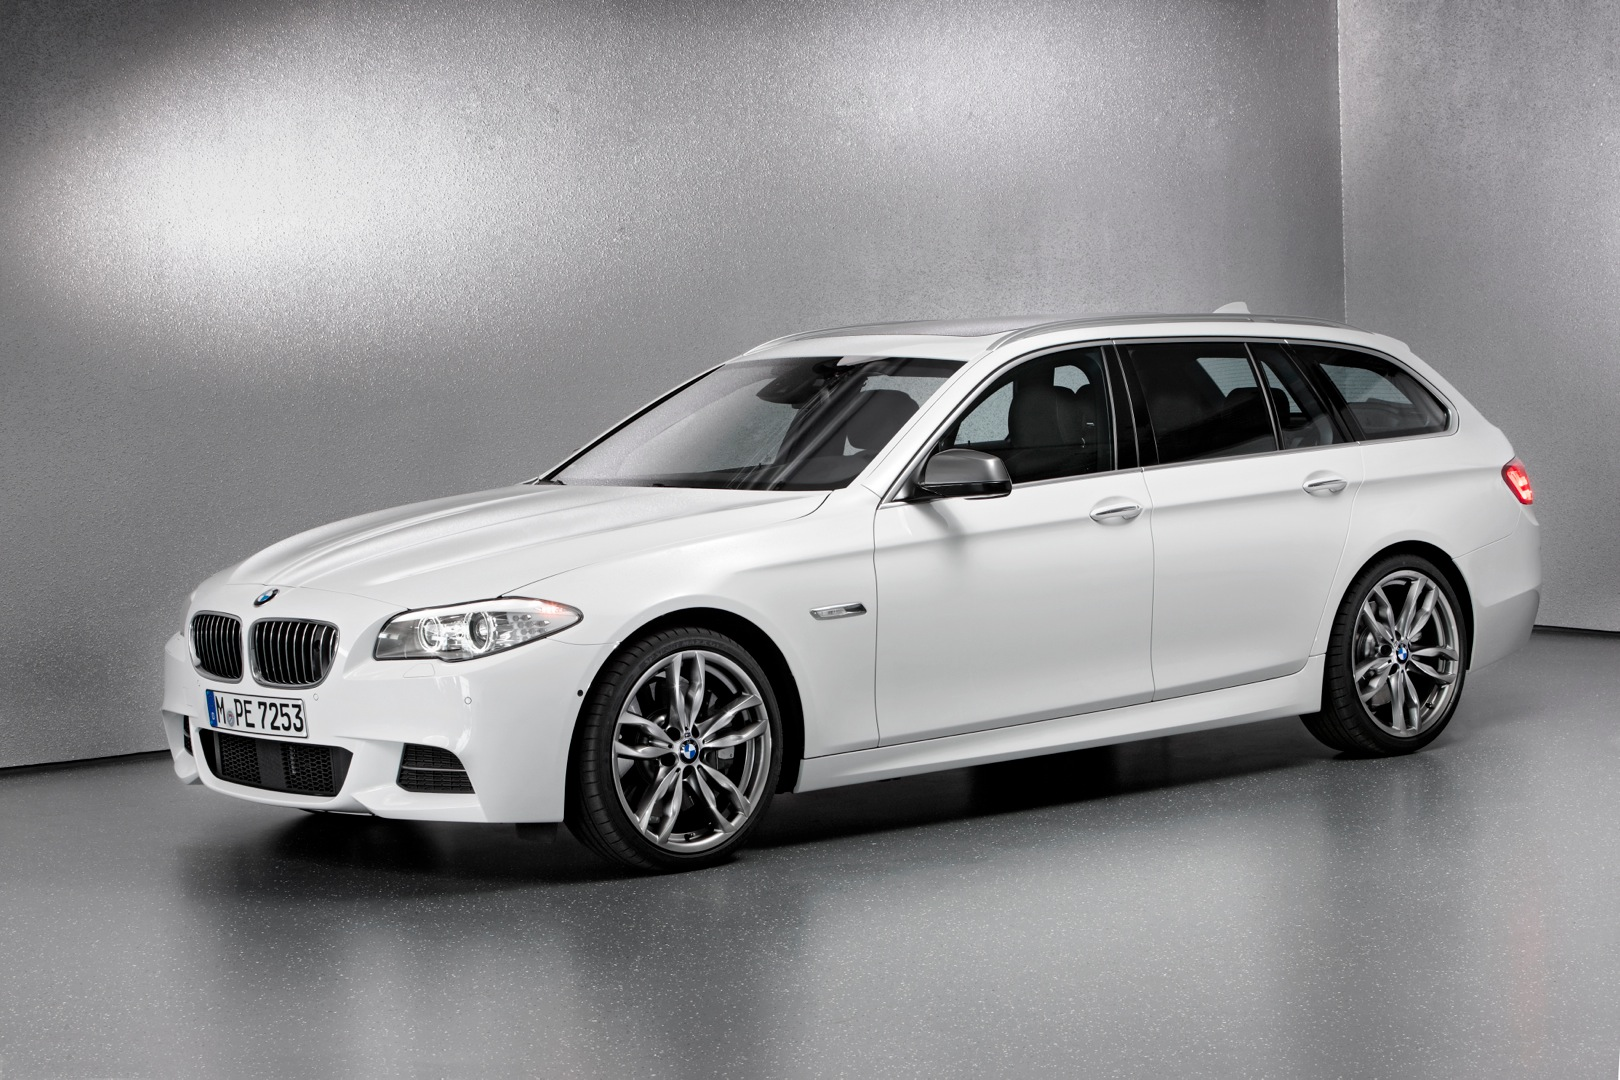 BMW 5 Series Touring (F11) LCI - 2013, 2014, 2015, 2016 ...